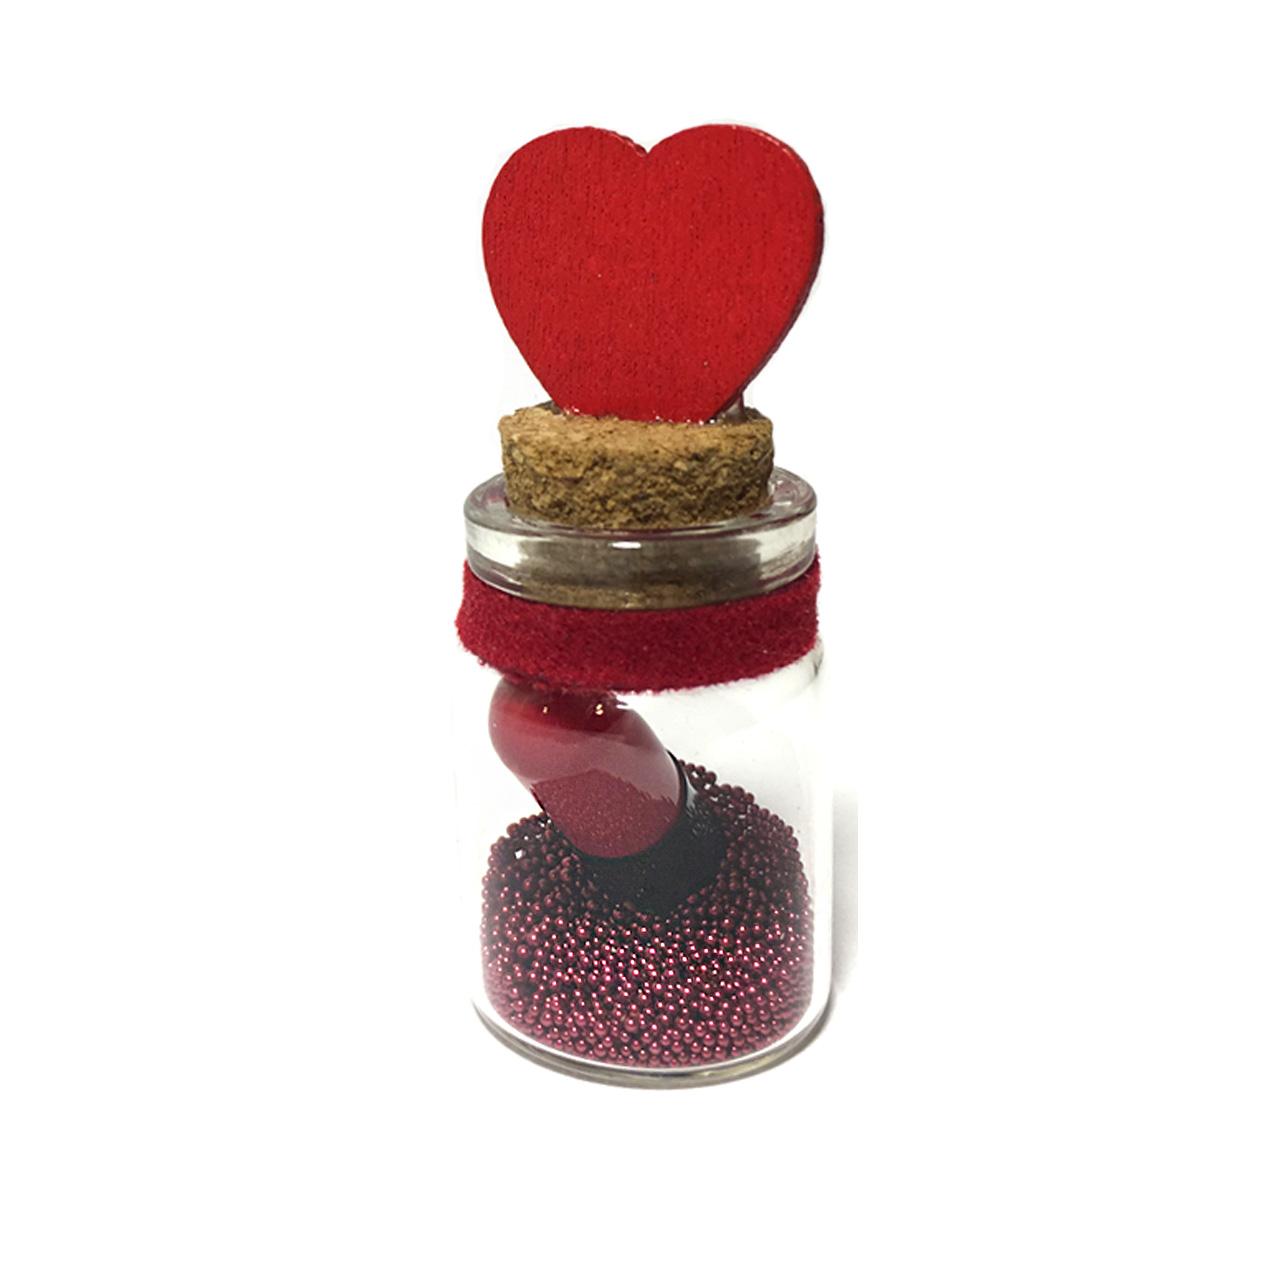 گیفت طرح کپسول عشق مدل Bottle Love07